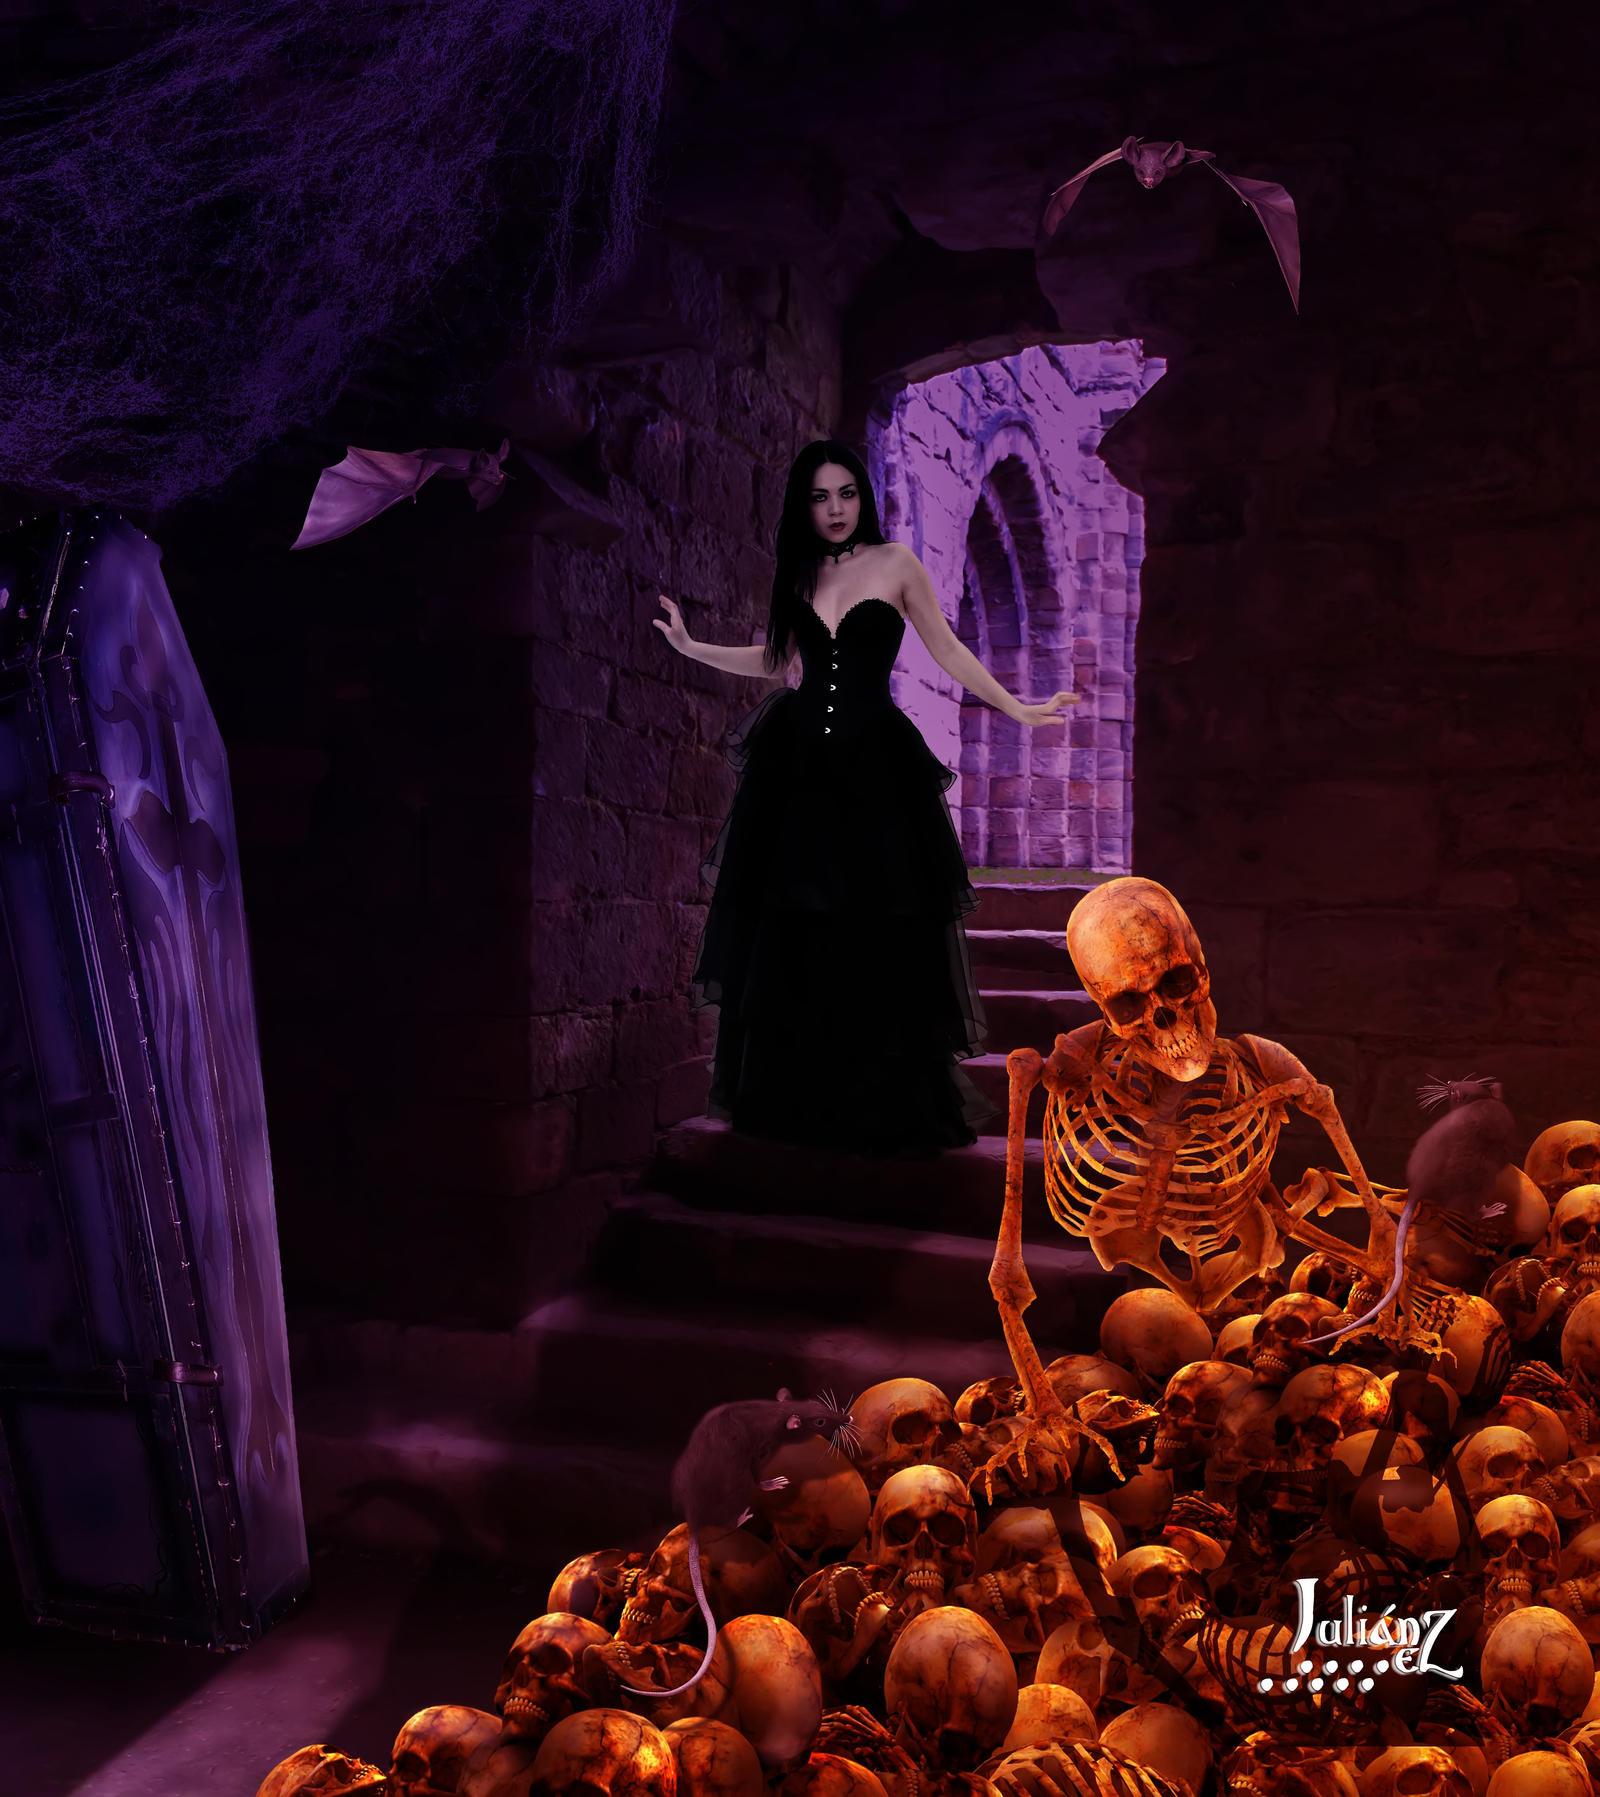 Vampiric quarters by Julianez